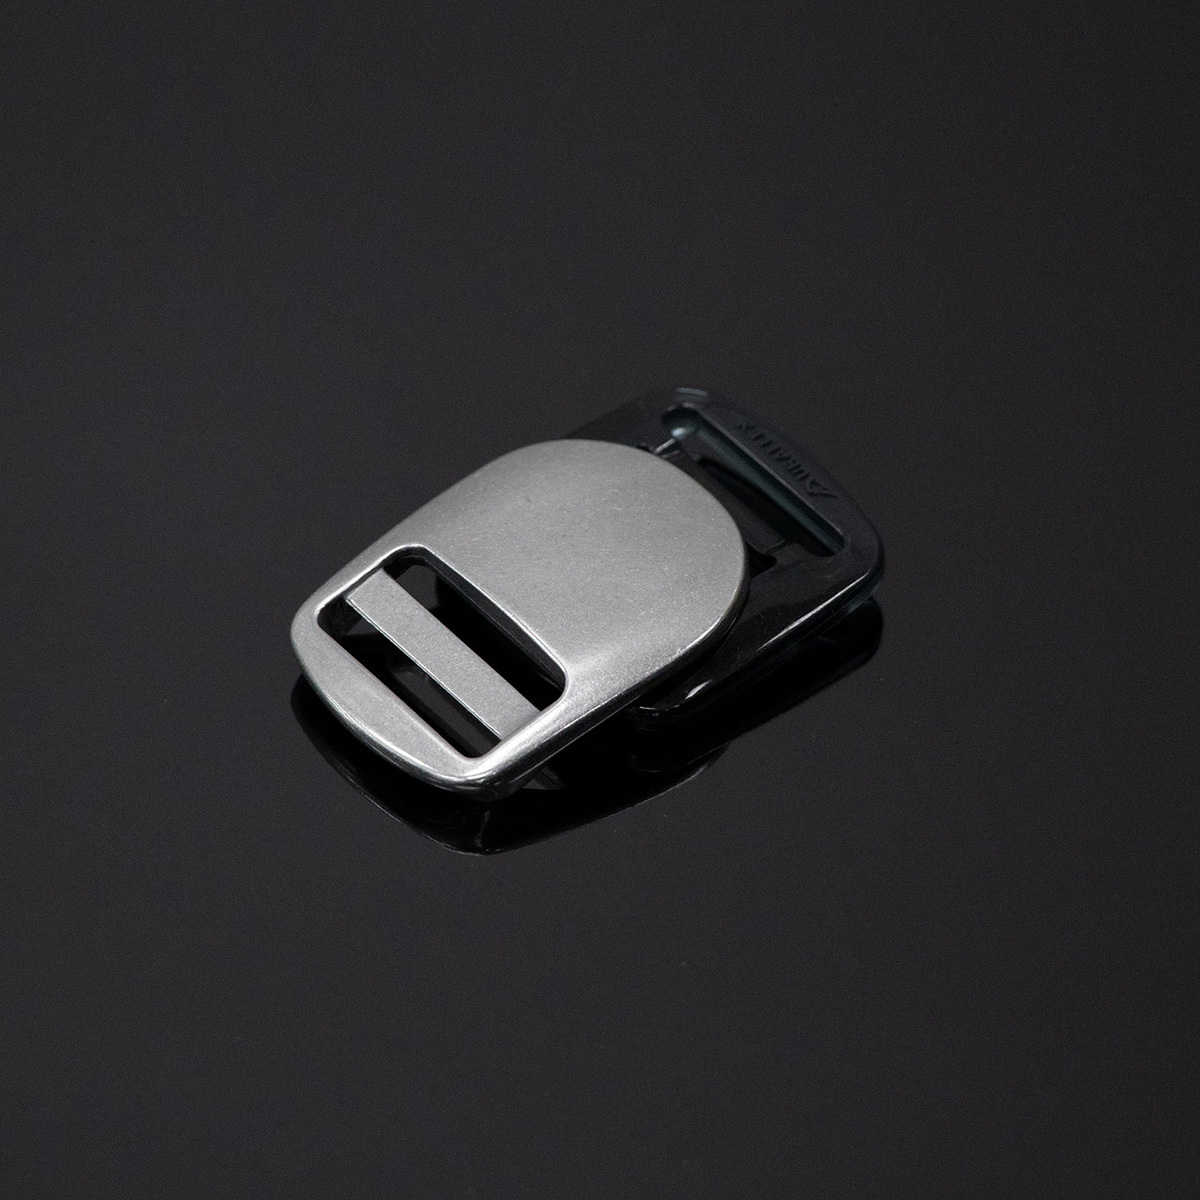 SIMPLX ALULAⓇ T-Lok Buckle